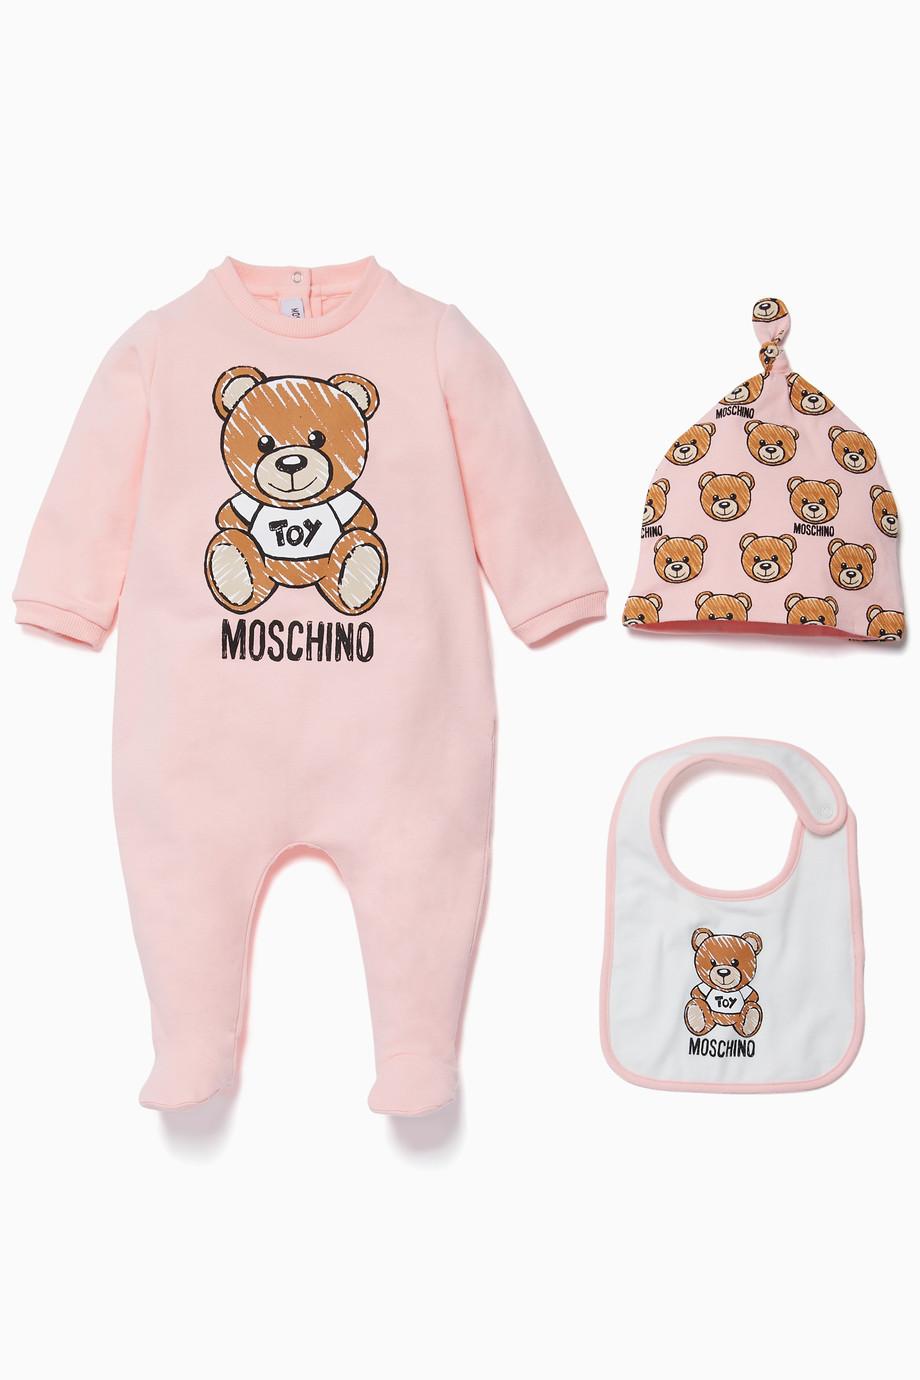 a8047f4a77c9 Shop Moschino Pink Pink Teddy Bear Romper